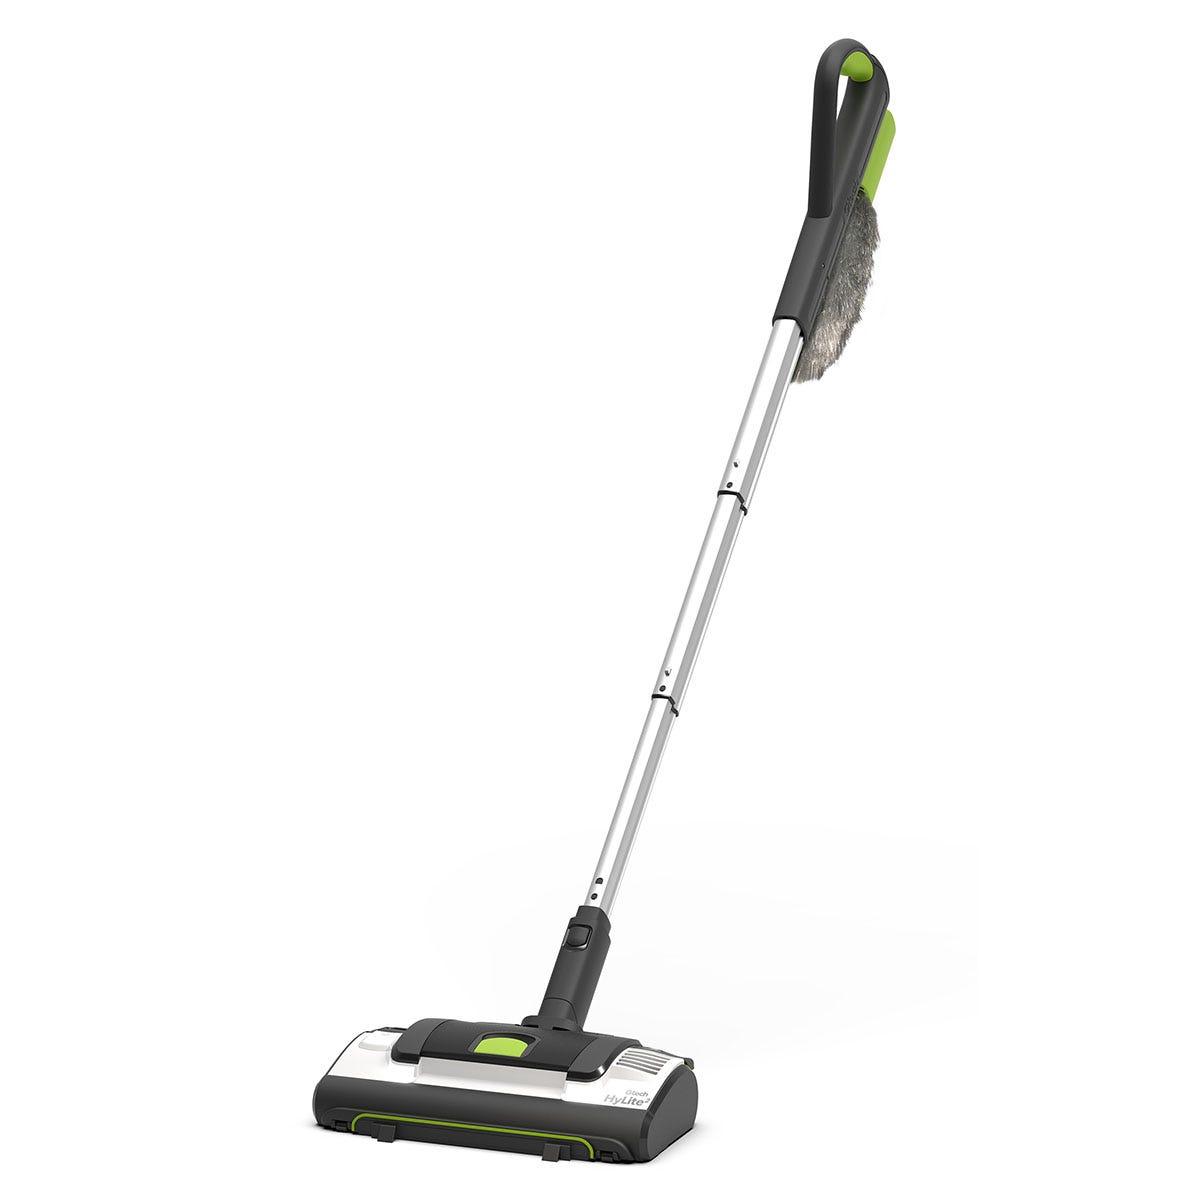 Gtech 1-03-250 Hylite 2 Vacuum Cleaner - White & Black